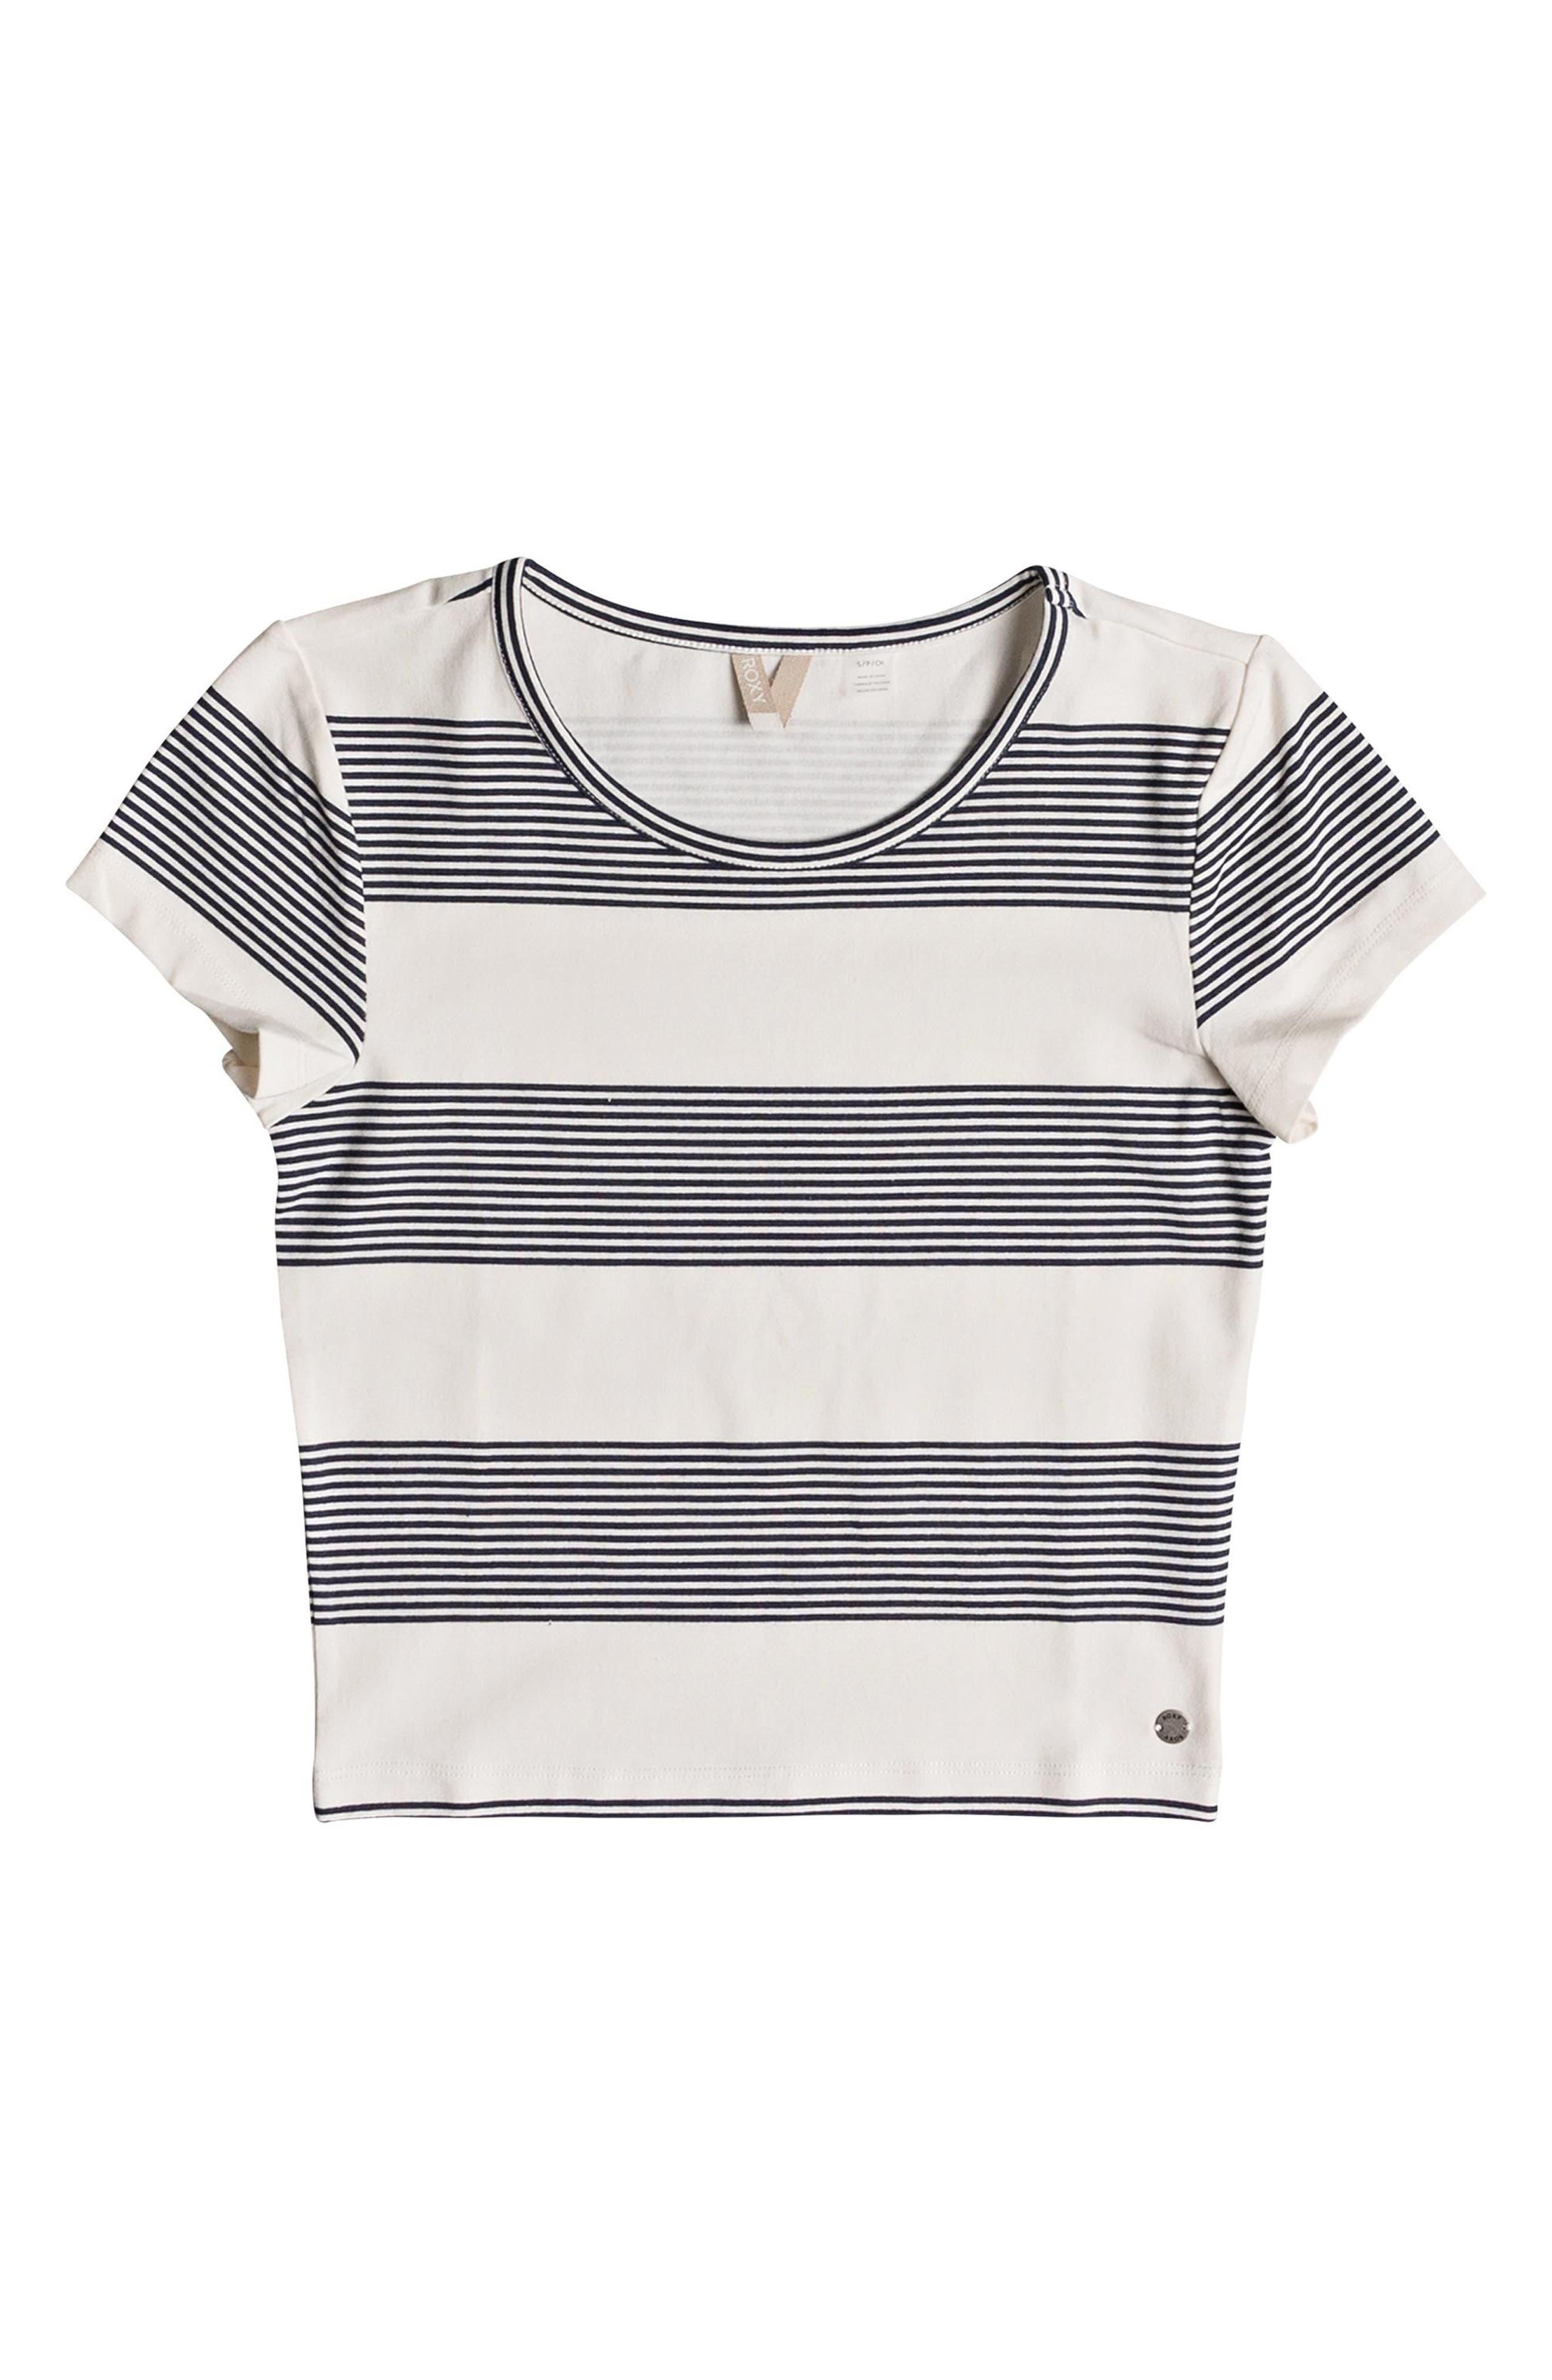 Parker Stripe Crop Top,                             Alternate thumbnail 4, color,                             Marshmallow Dress Blue Docker